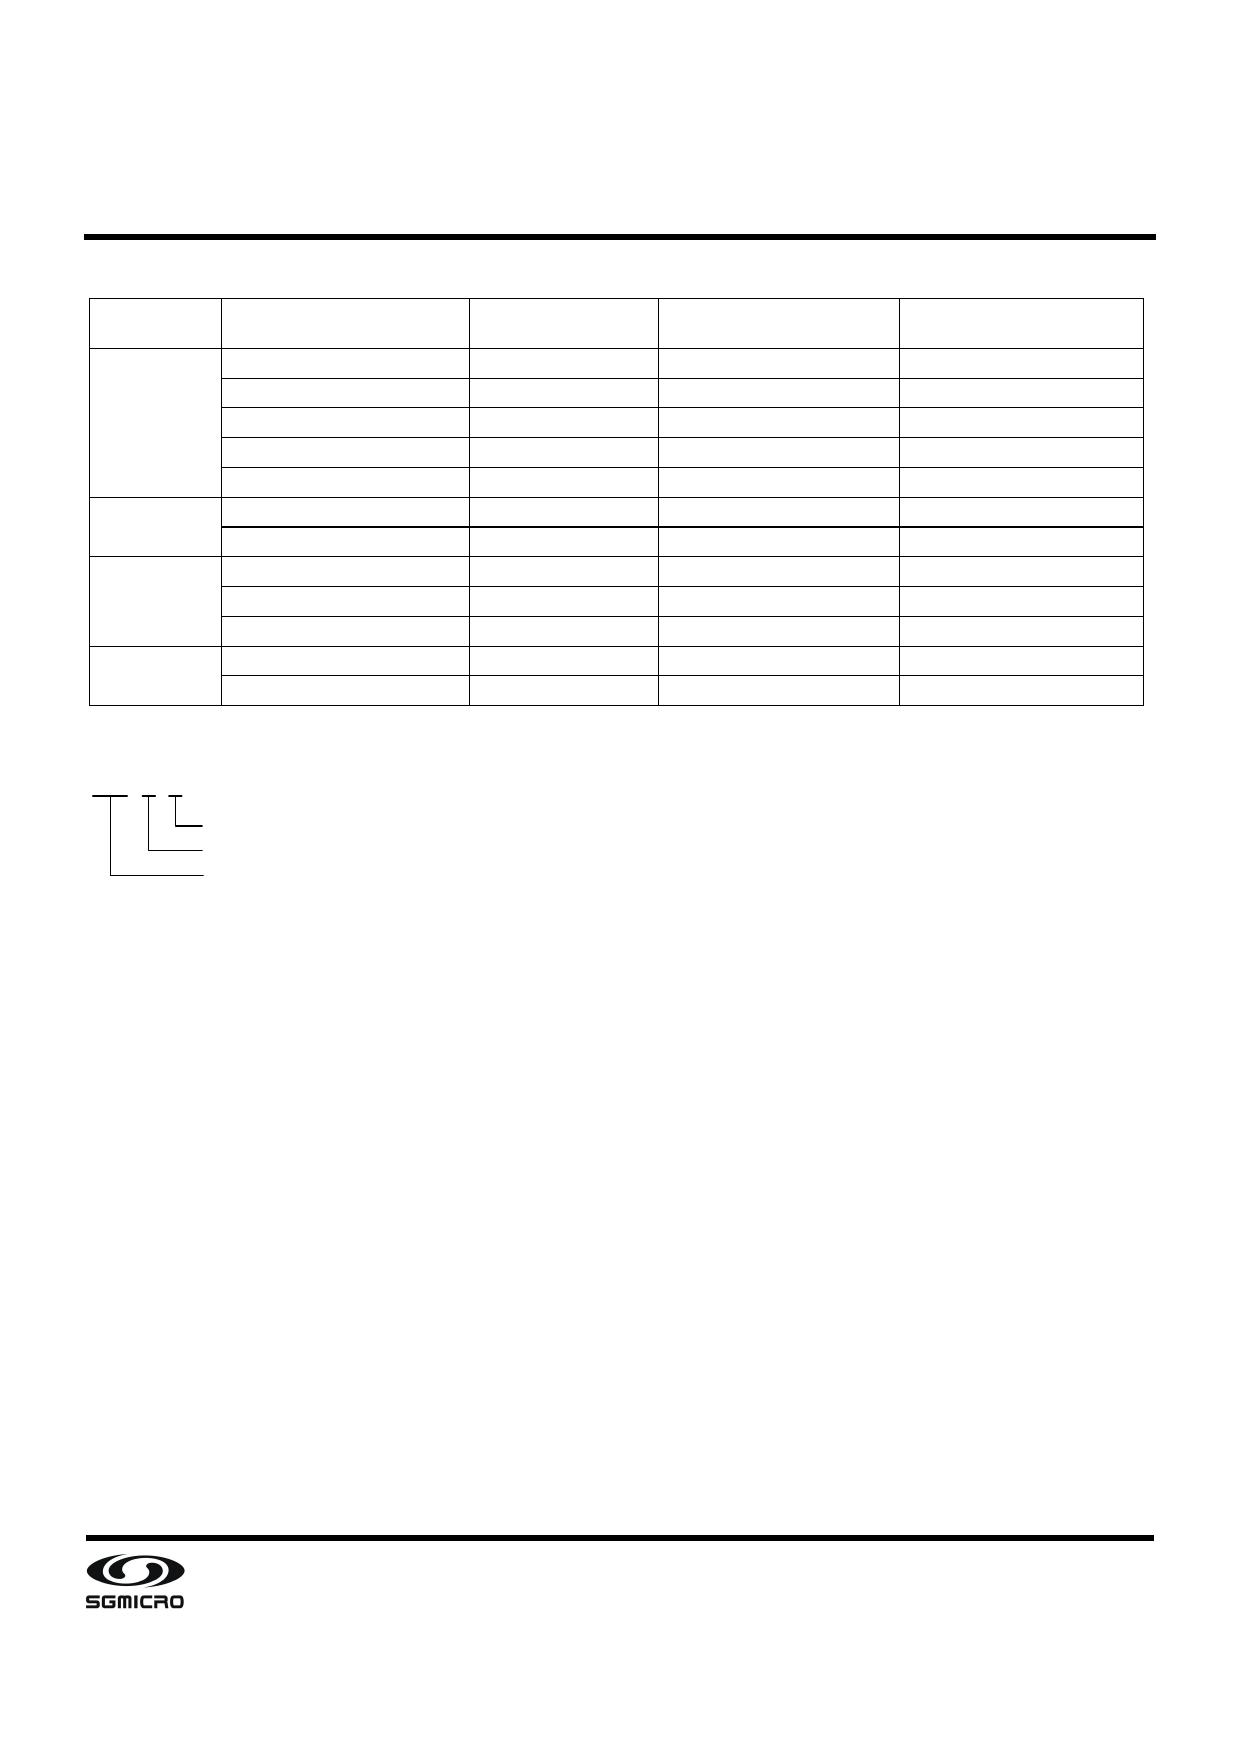 SGM8931 pdf, schematic